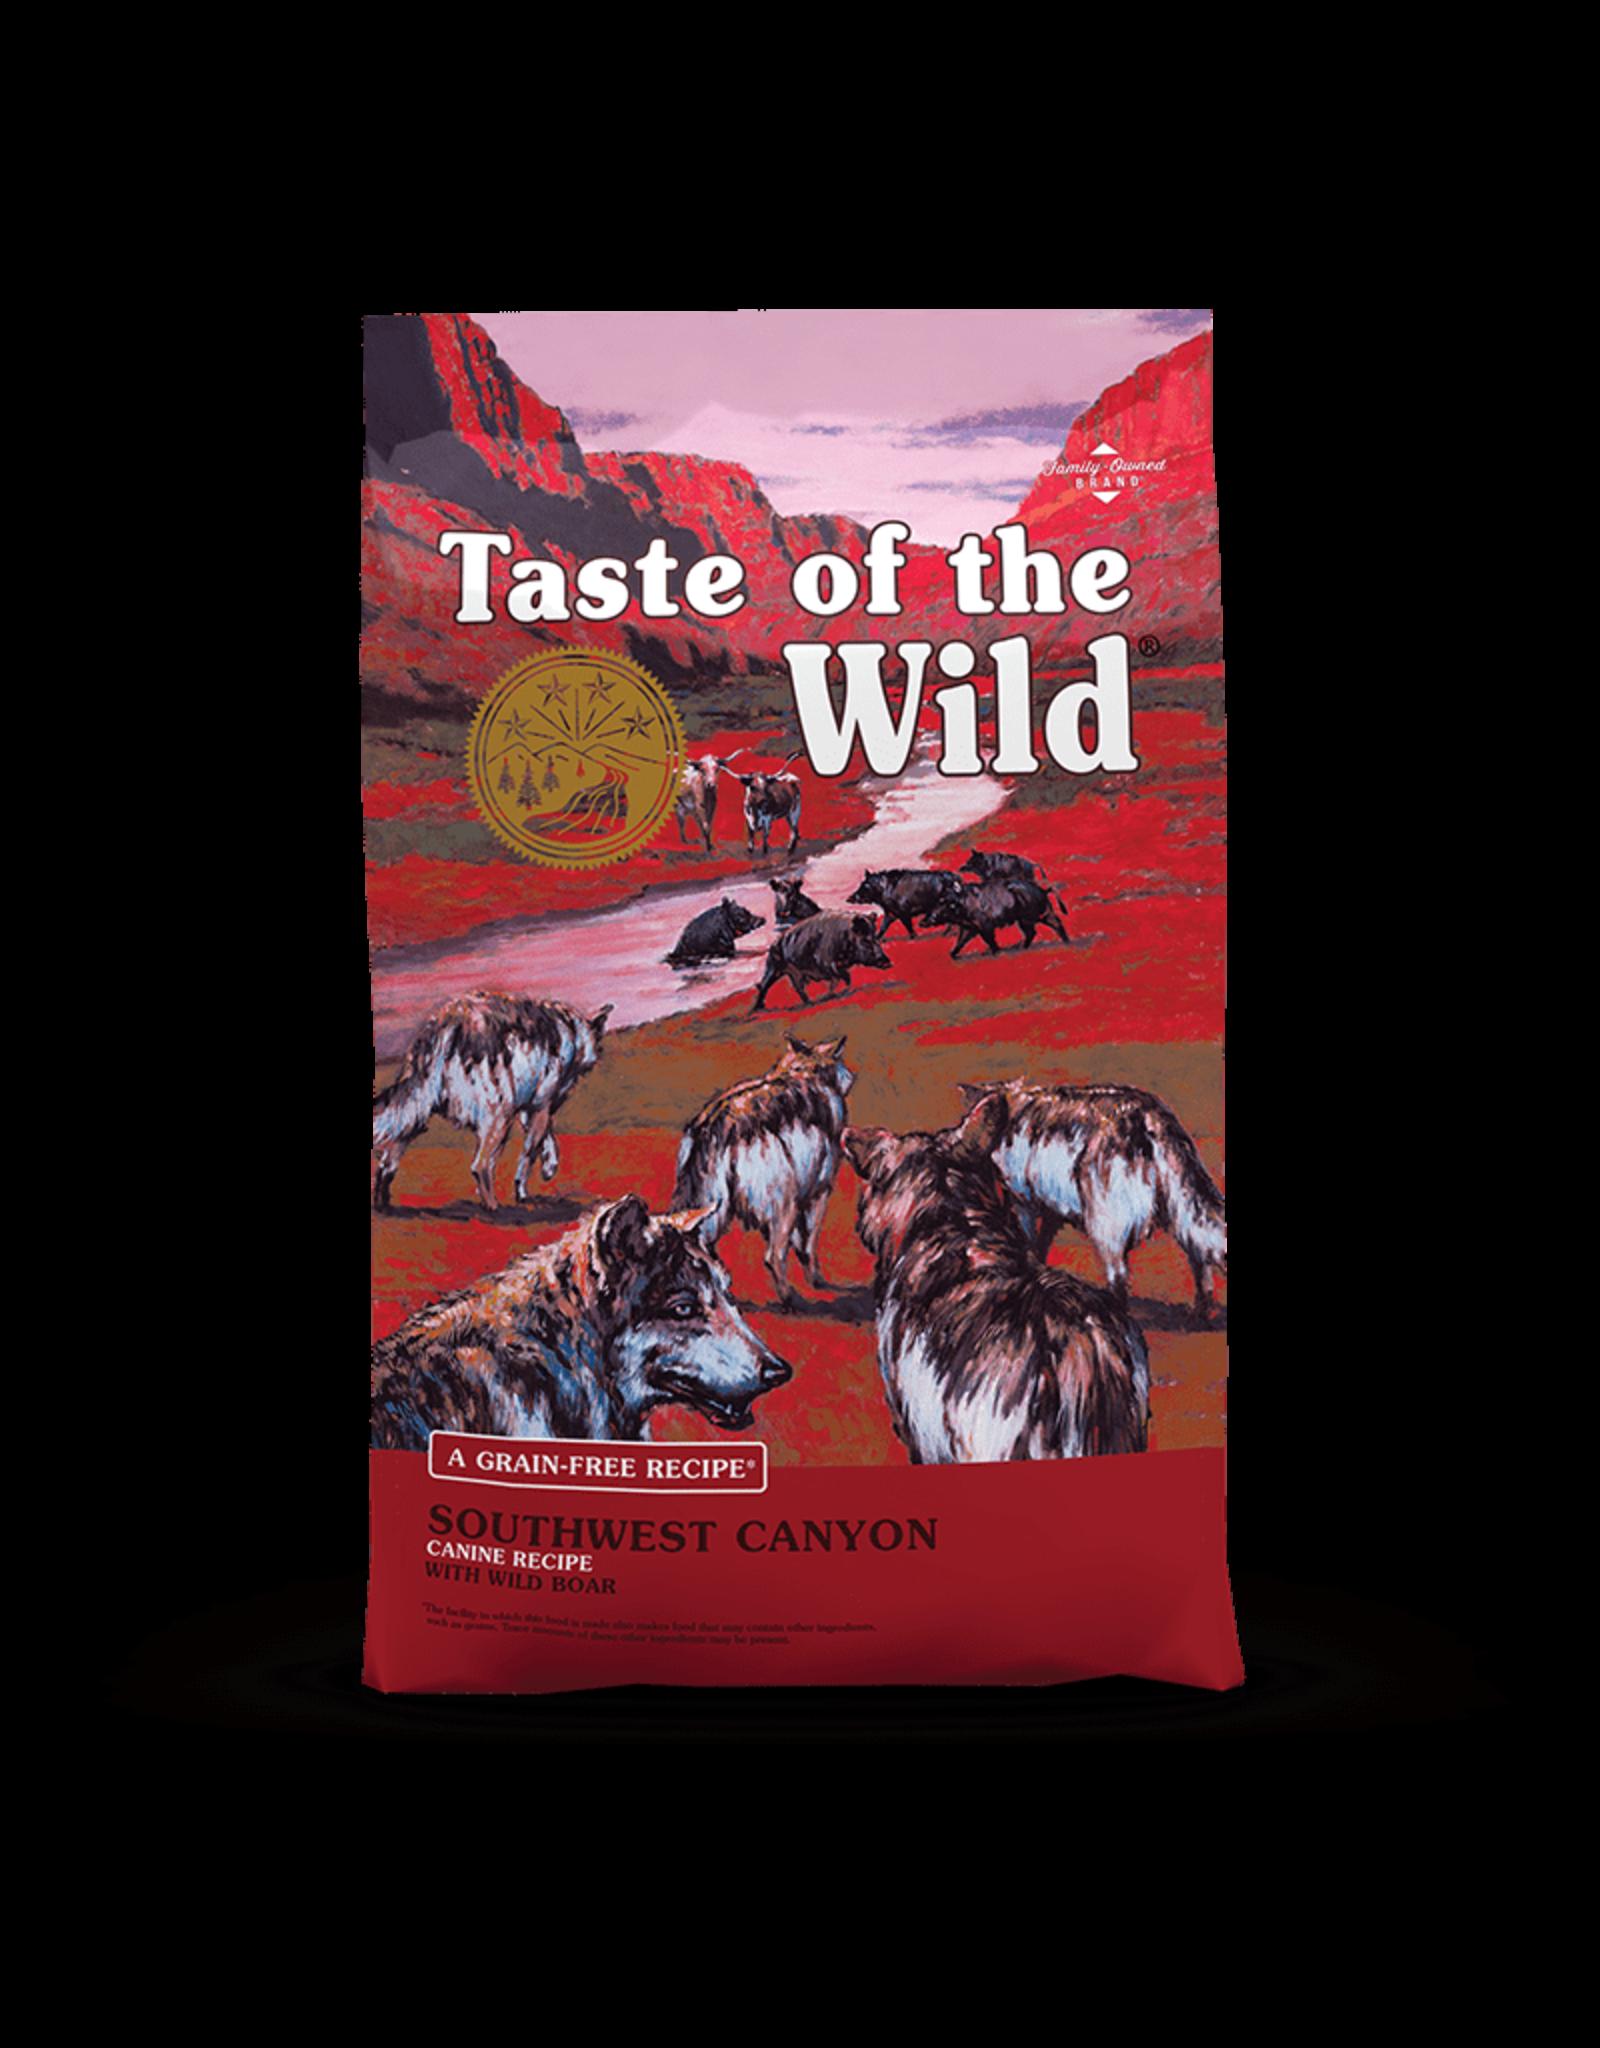 Taste of the Wild Taste of the Wild Southwest Canyon Grain-Free Canine Recipe